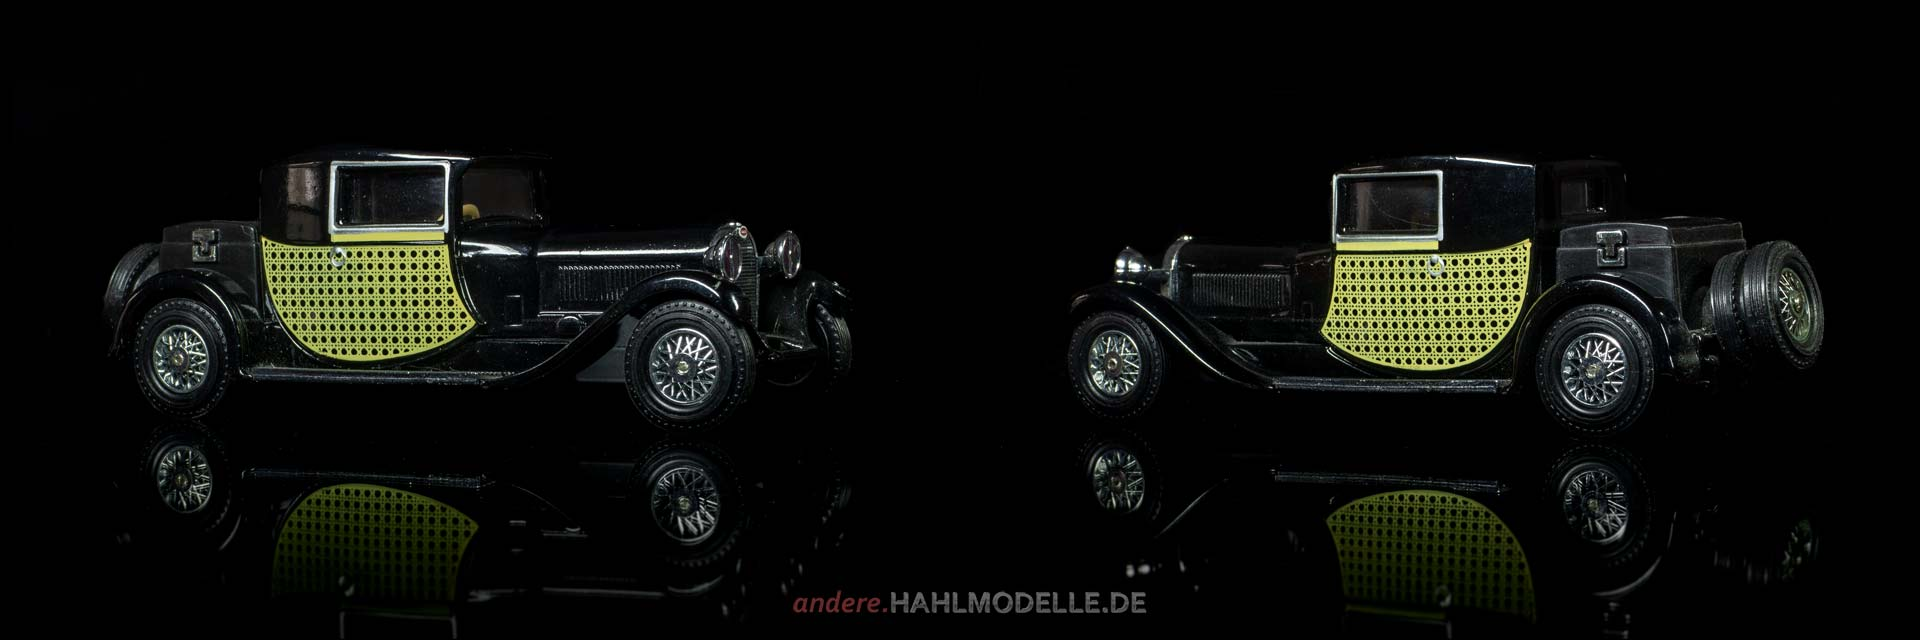 Bugatti Type 44 Fiacre (Gangloff) | Coupé | Matchbox | 1:43 | www.andere.hahlmodelle.de